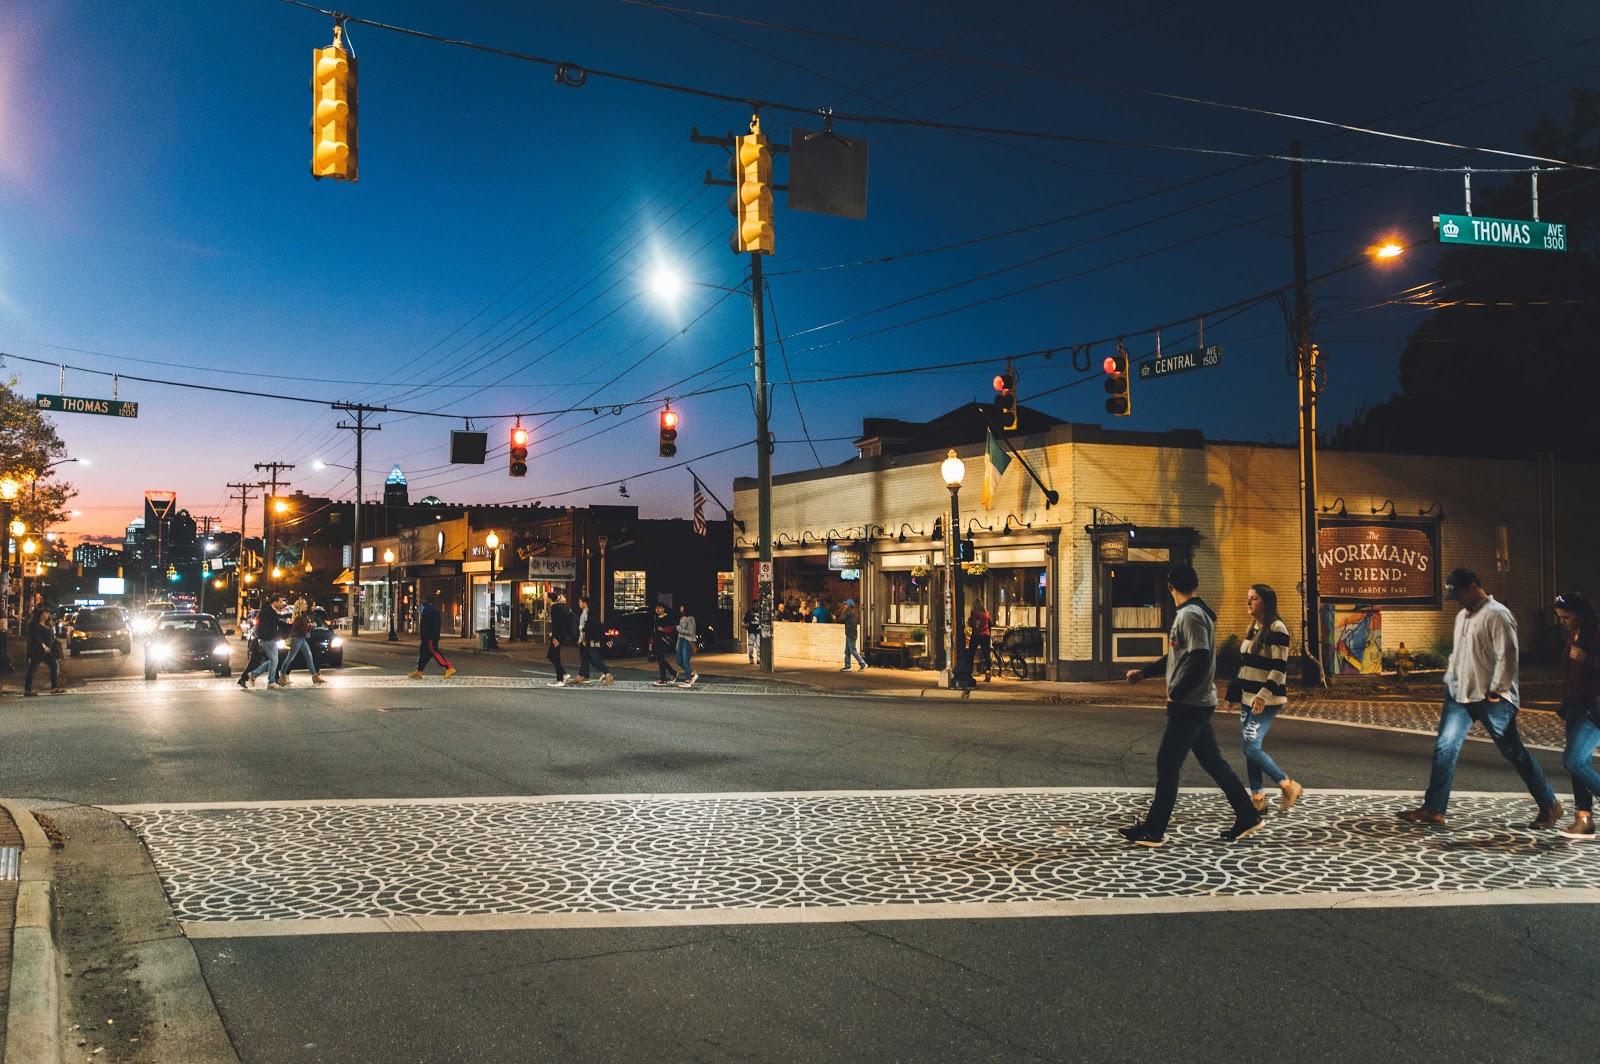 An intersection in the Plaza Midwood neighborhood of Charlotte, photo via charlottesgotalot.com